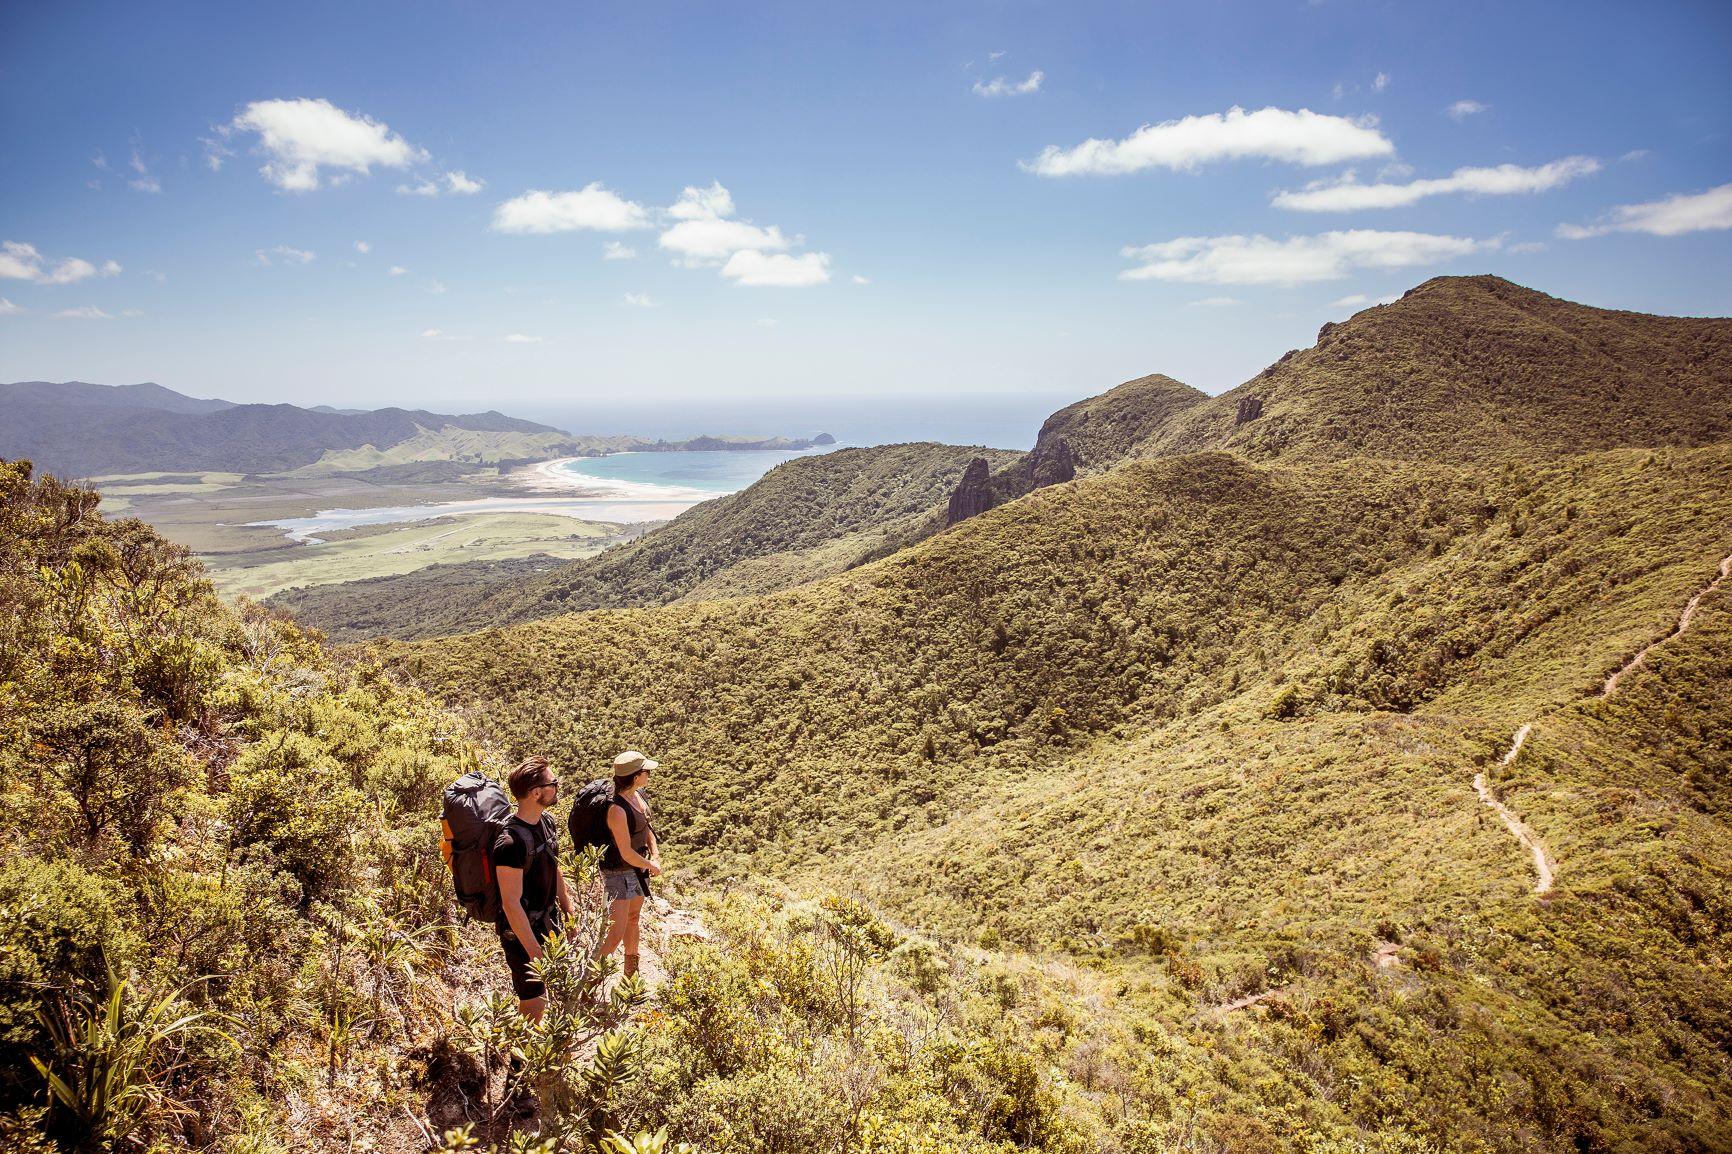 Kiwi PM confirms plans for trans-Tasman 'travel bubble'